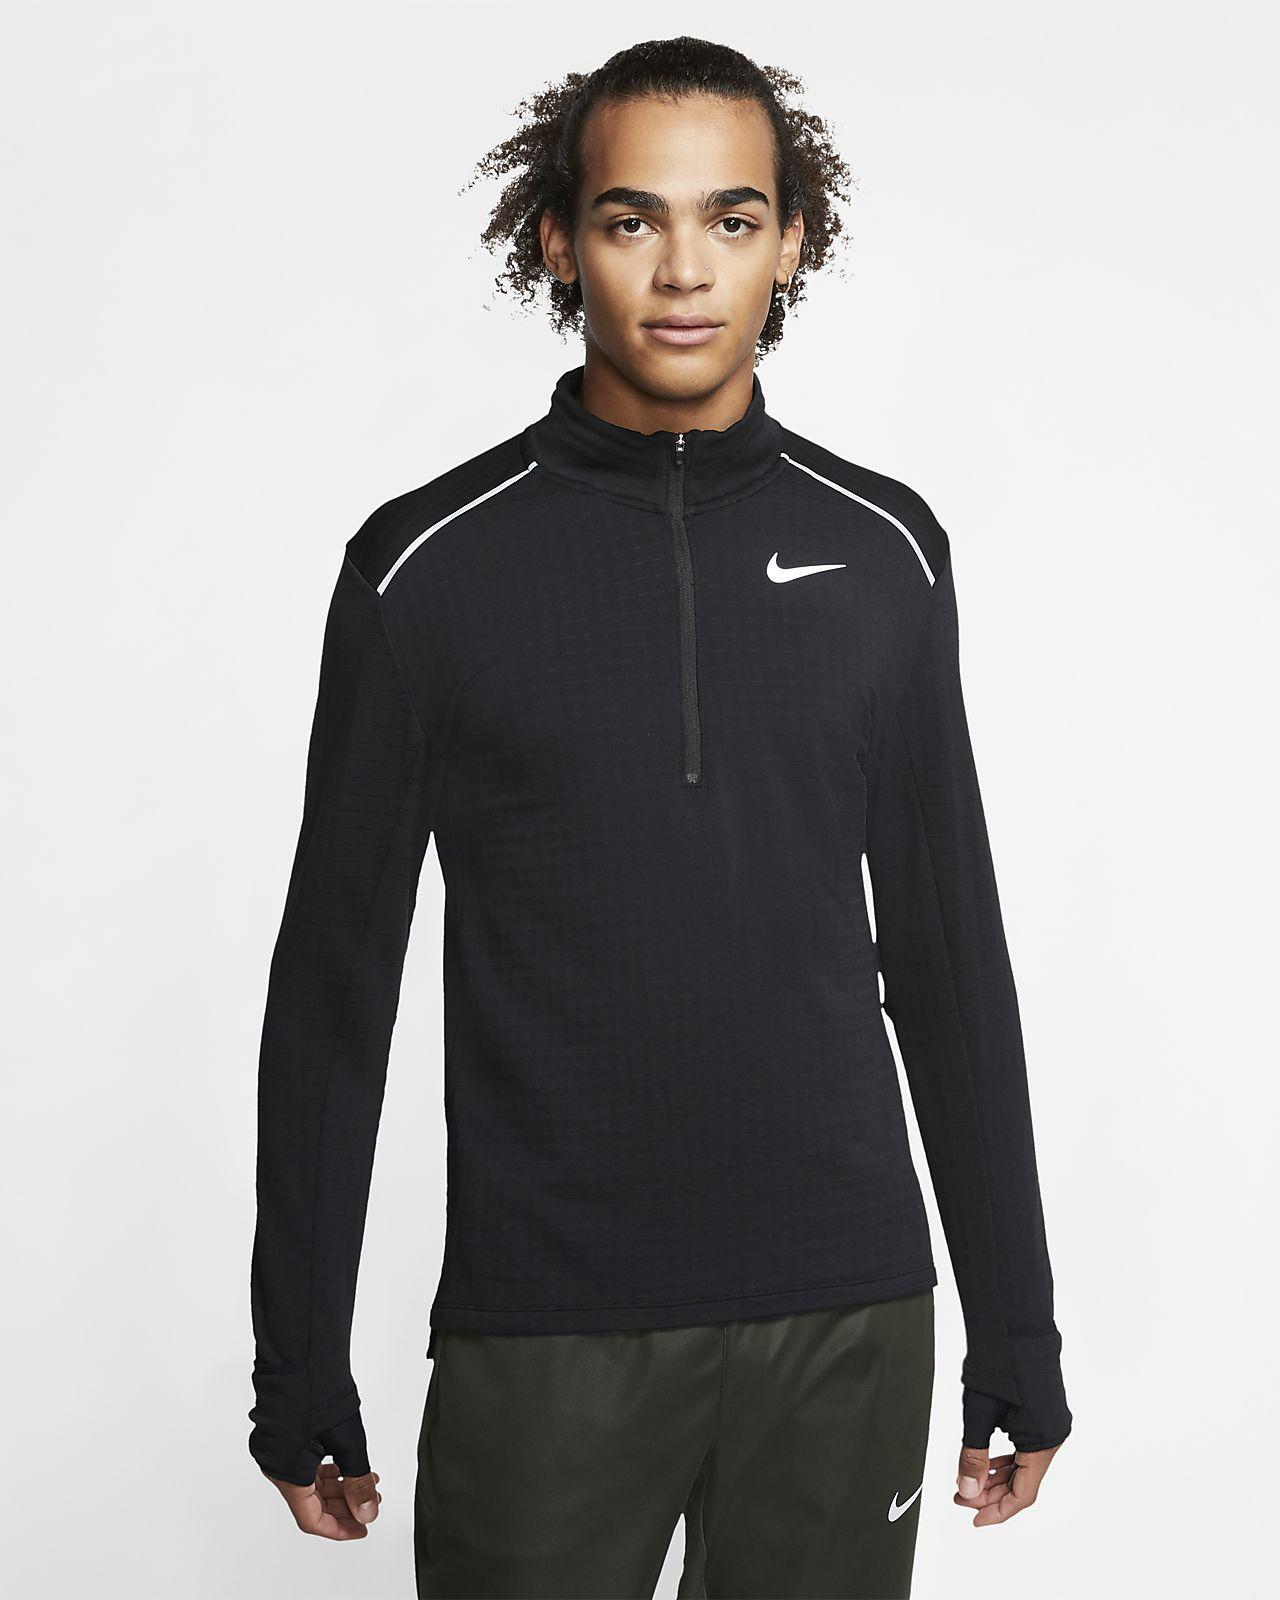 Nike Therma-Sphere 3.0 Men's 1/2-Zip Running Top